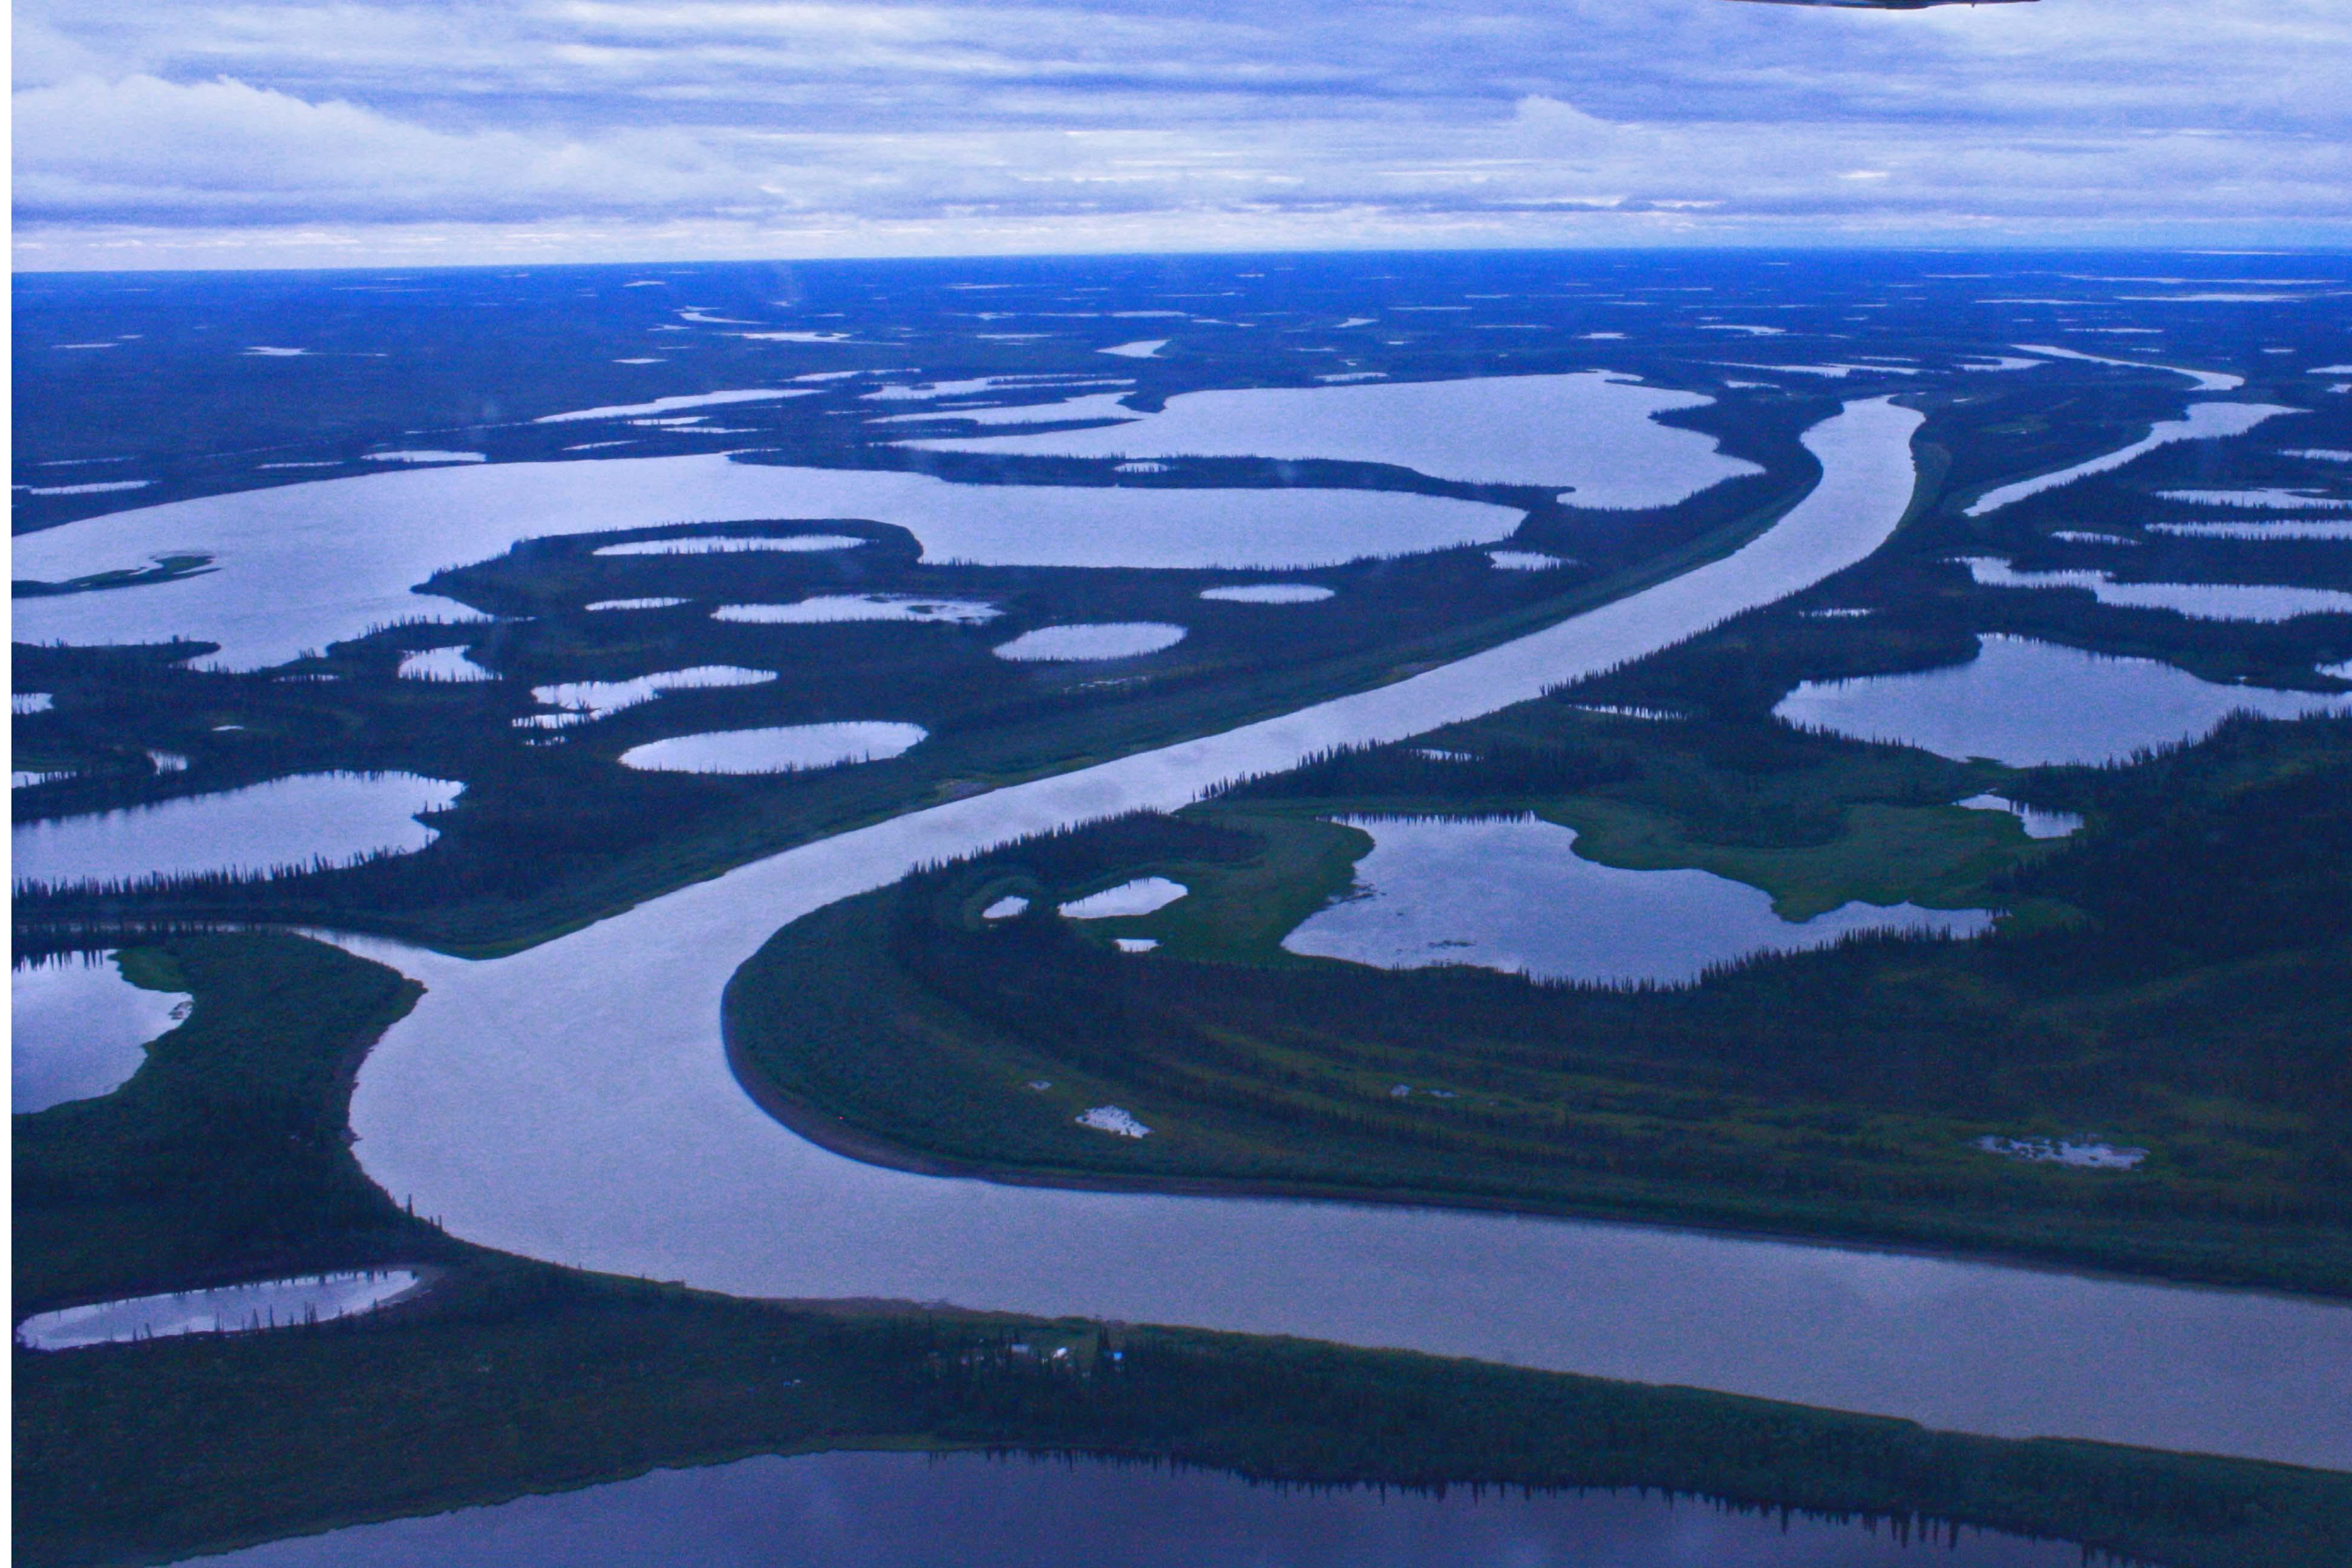 Mackenzie – longest rivers in the world